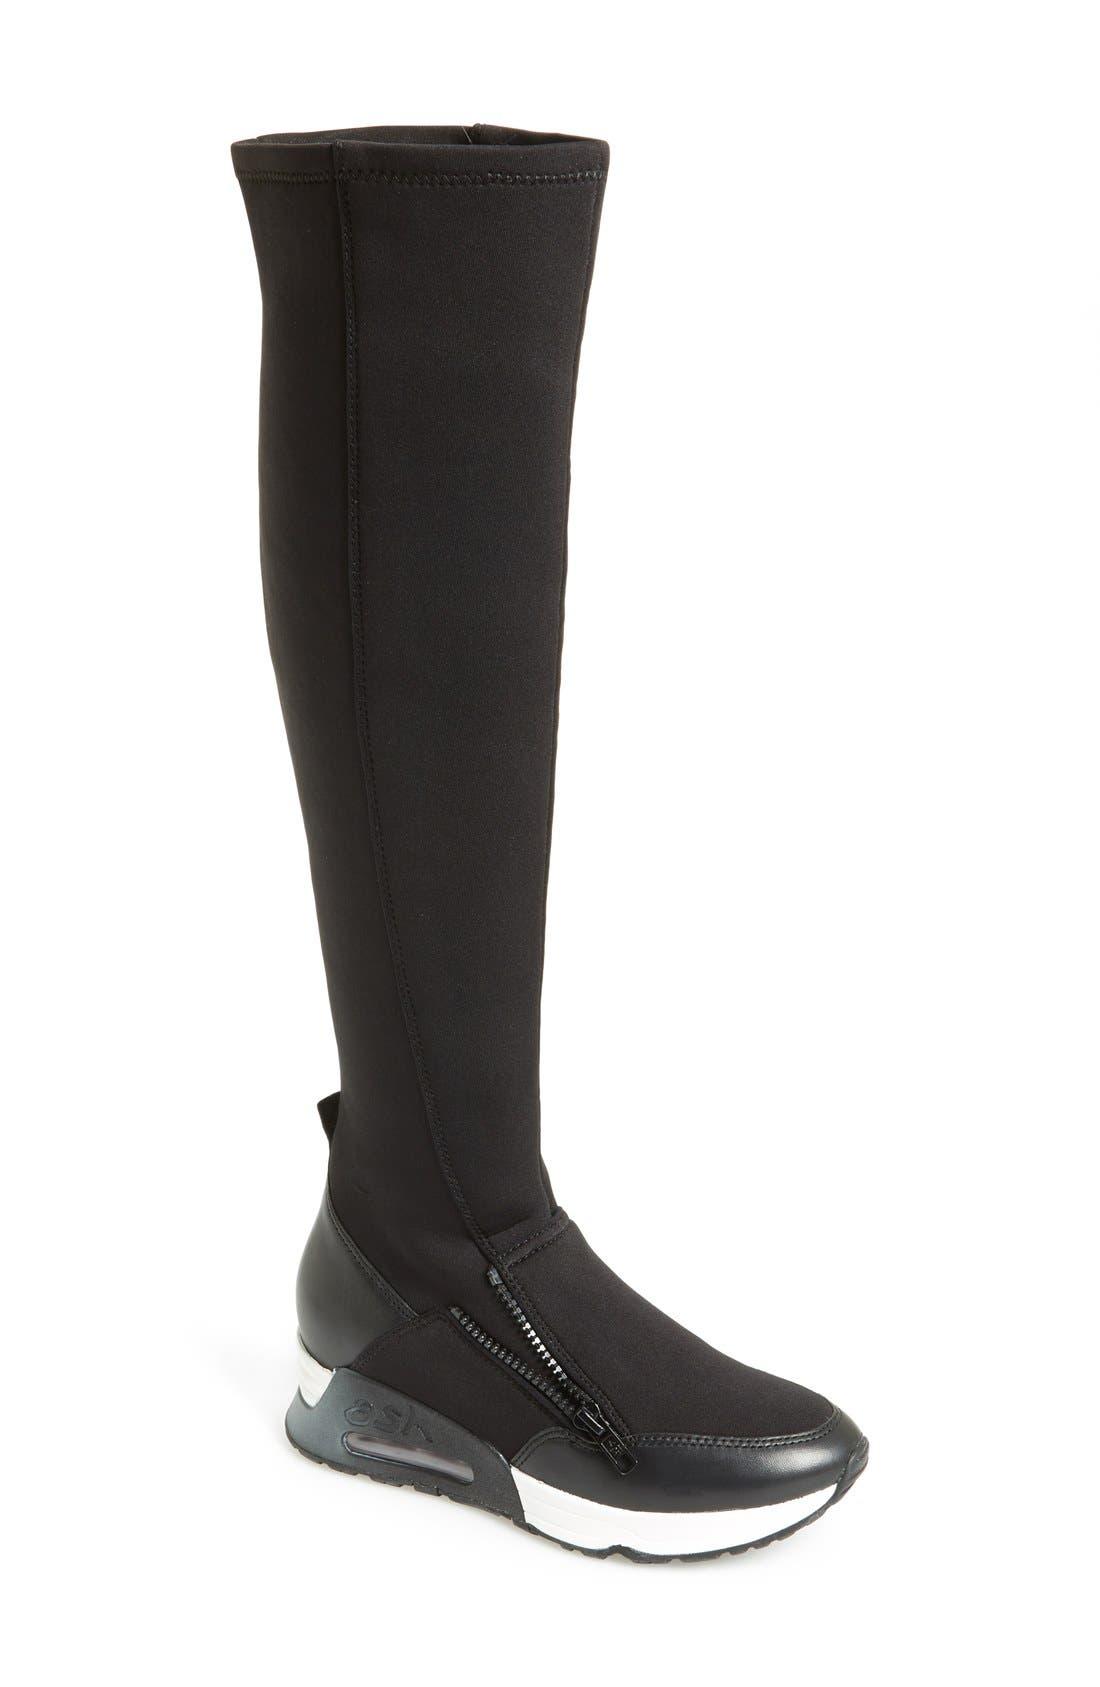 Main Image - Ash 'Lynx' Stretch Fabric Tall Sneaker Boot (Women)